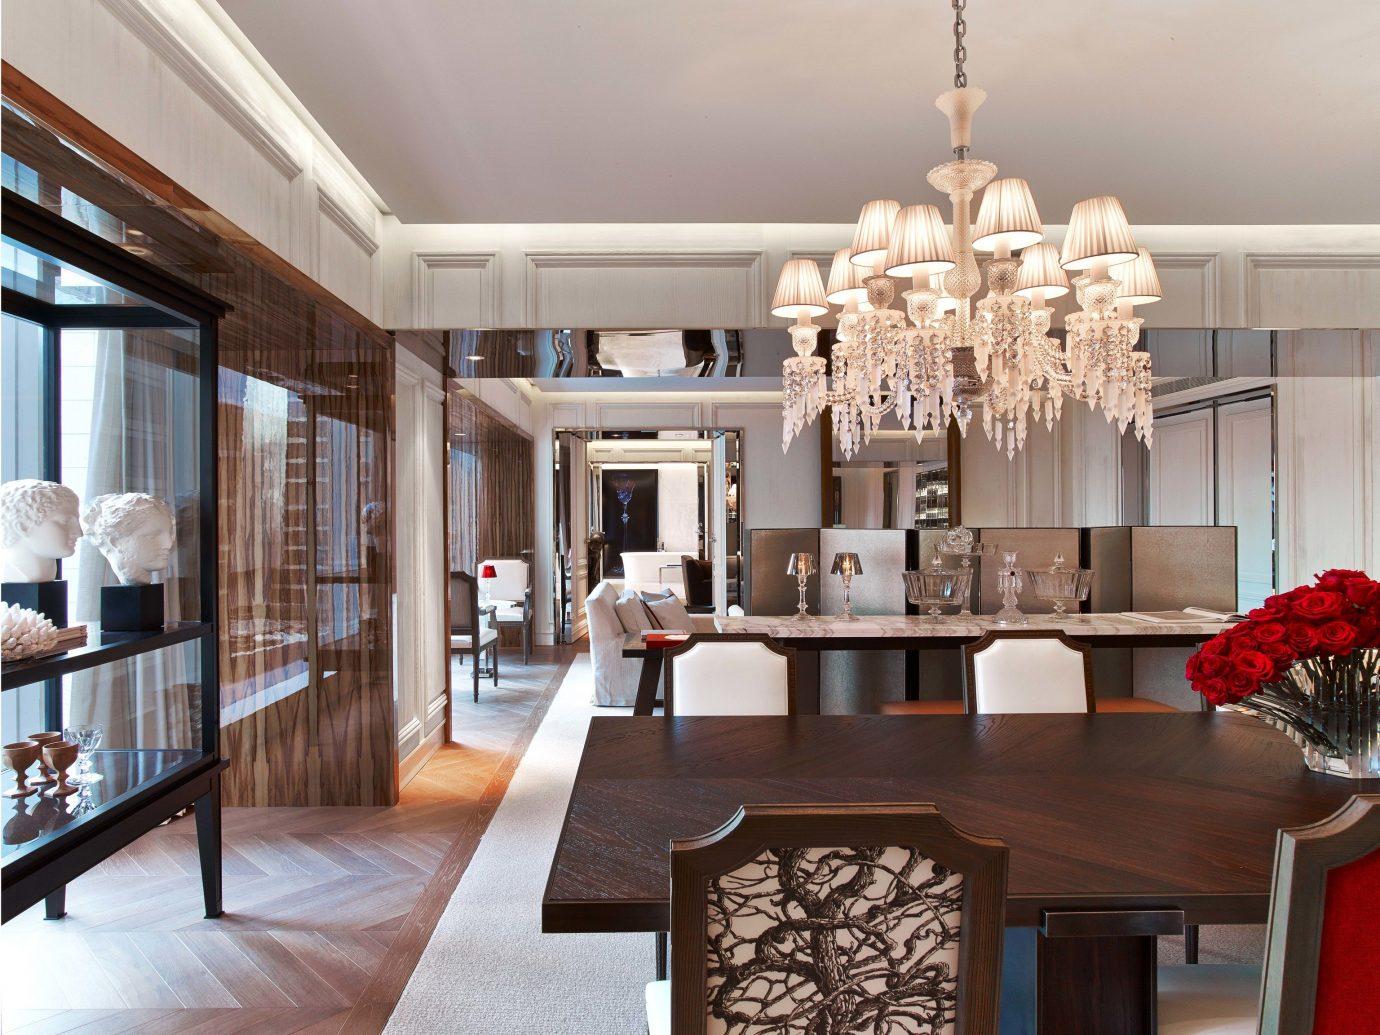 Hotels Luxury Travel indoor table floor room interior design dining room living room ceiling interior designer furniture dining table